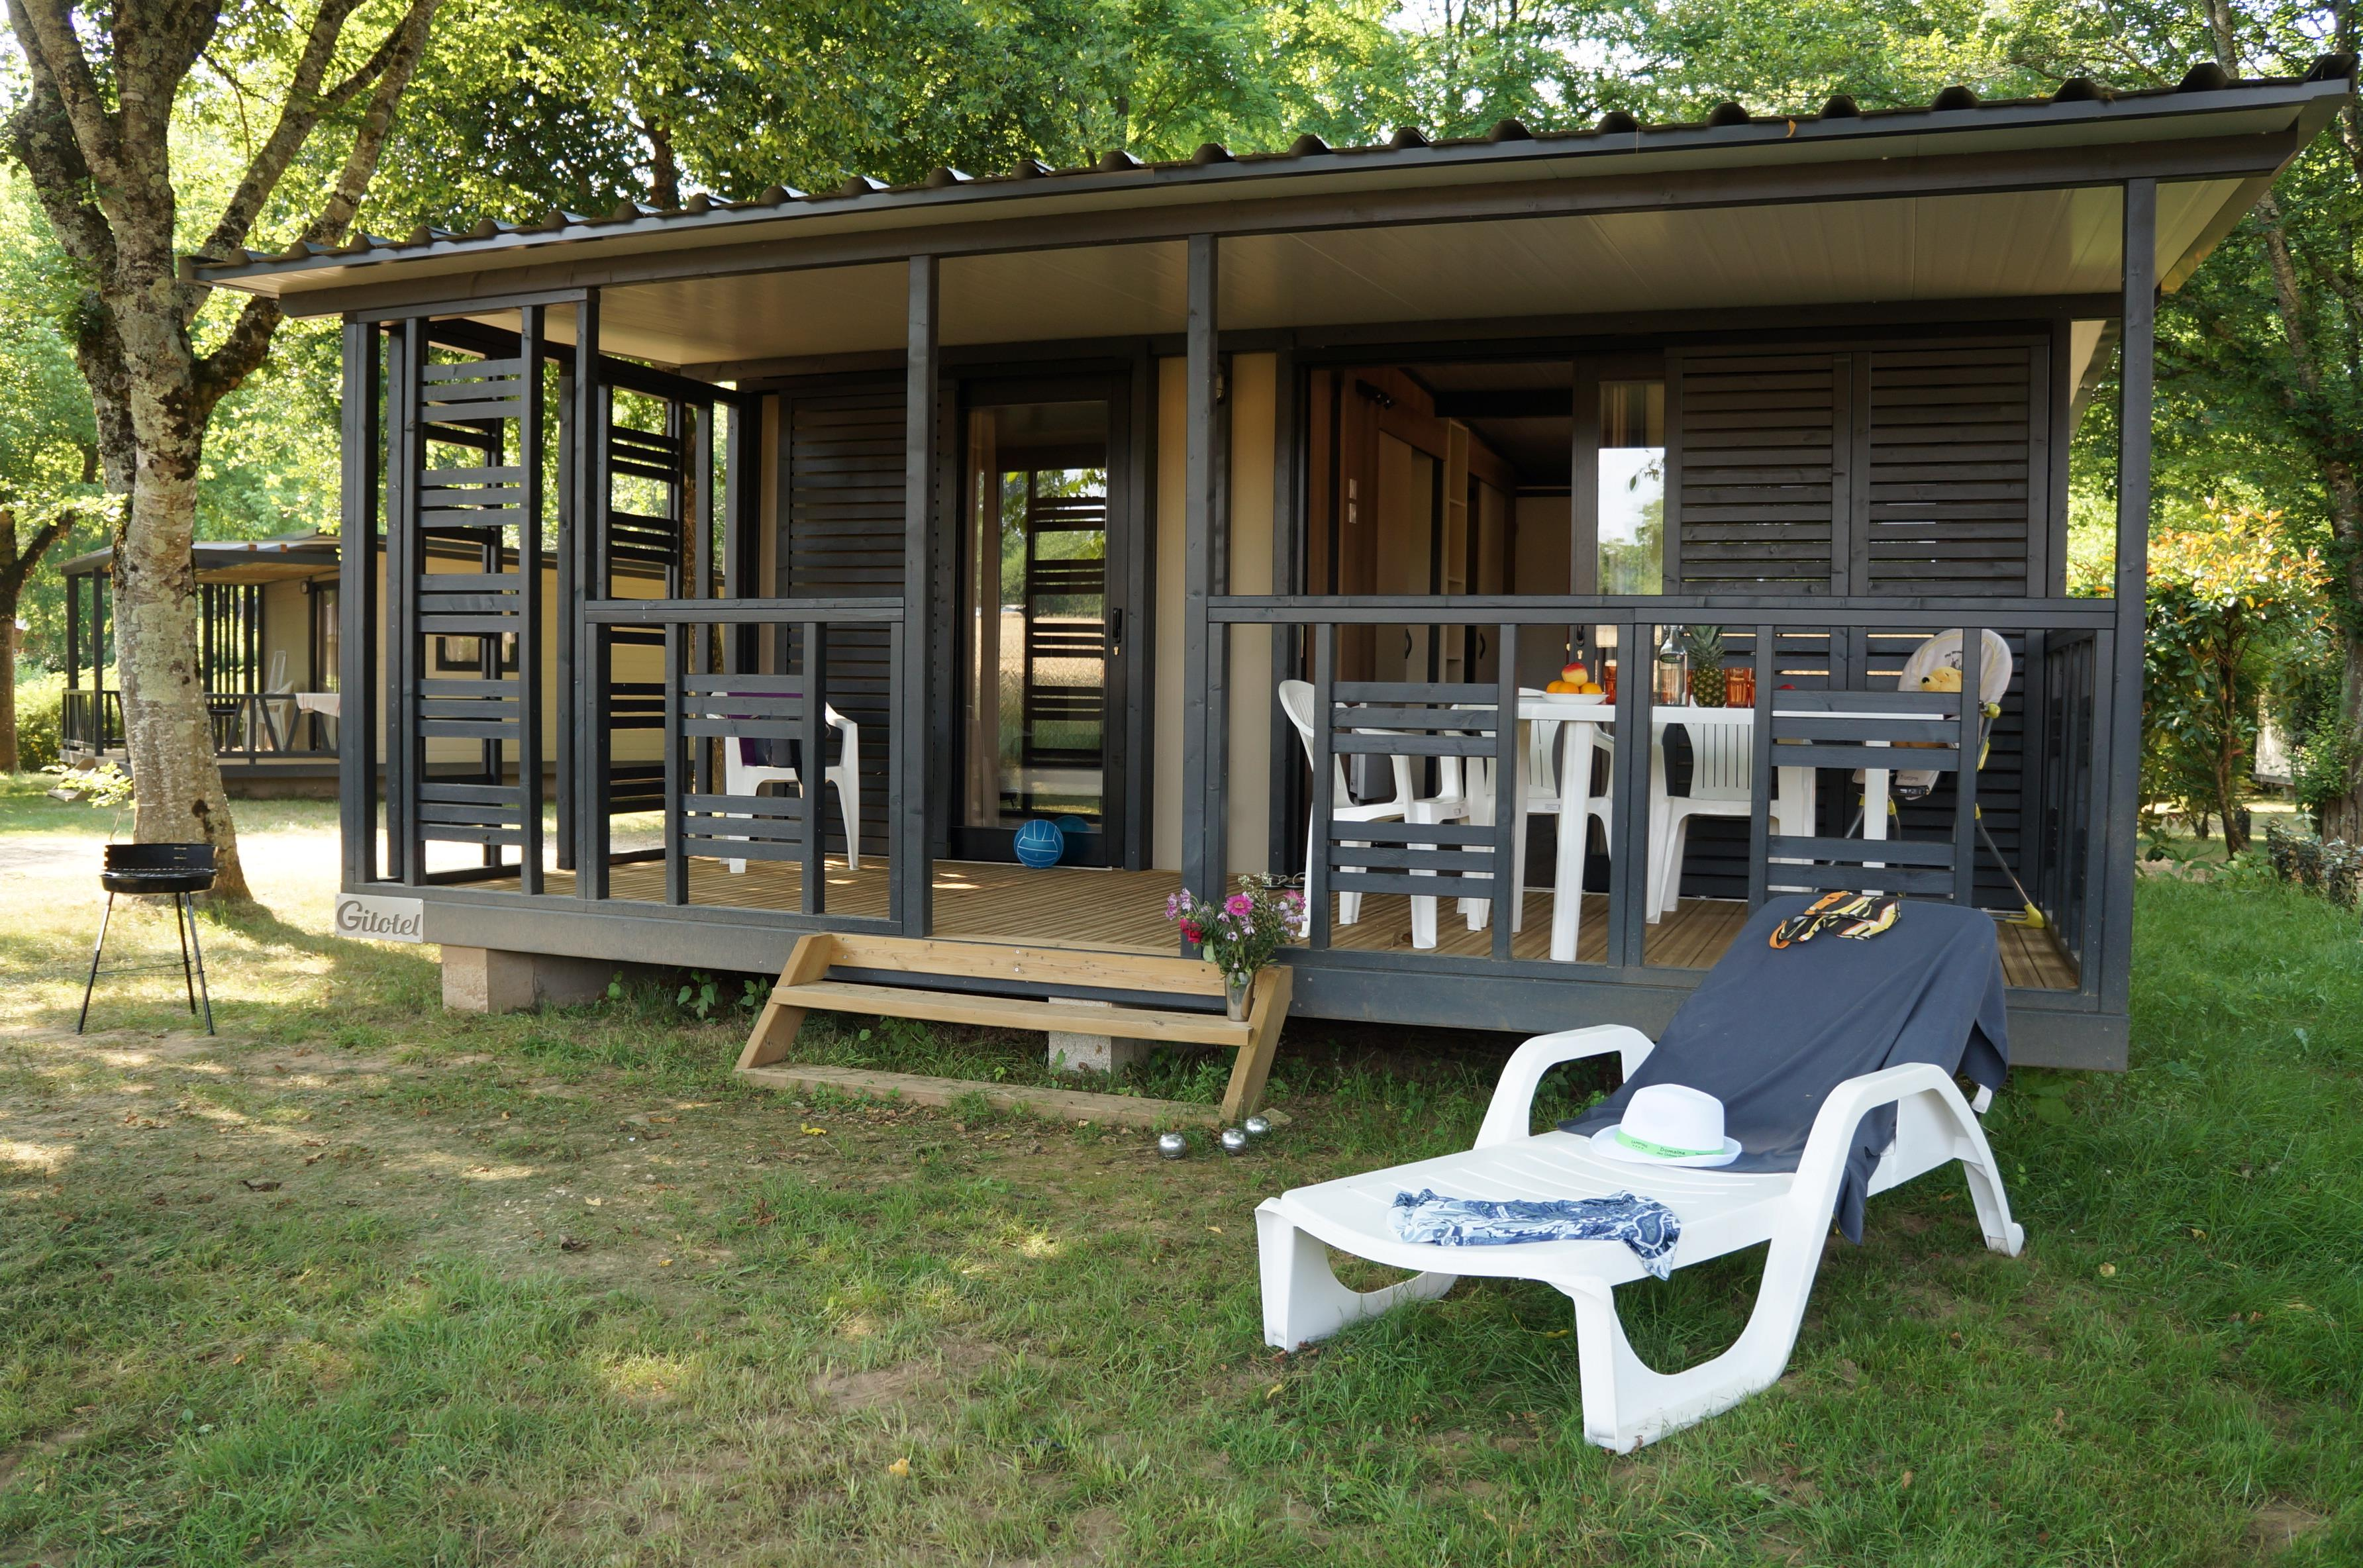 Location - Chalet Vitrac - Camping Domaine des Chênes Verts